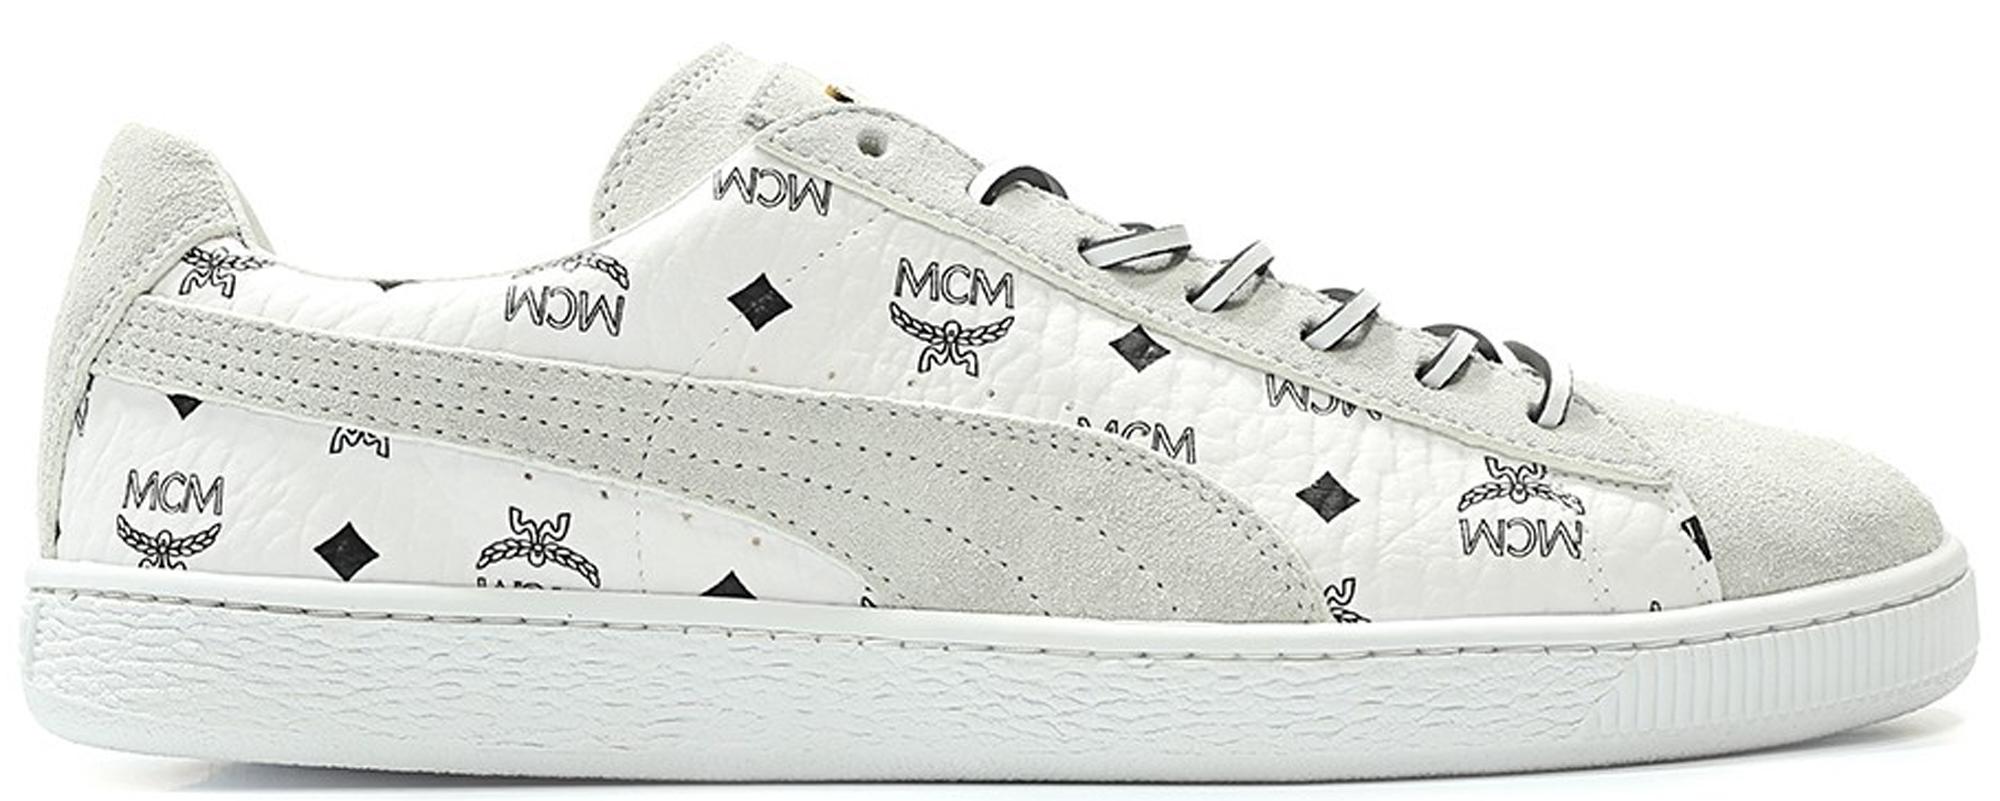 Puma Suede Classic MCM (White)